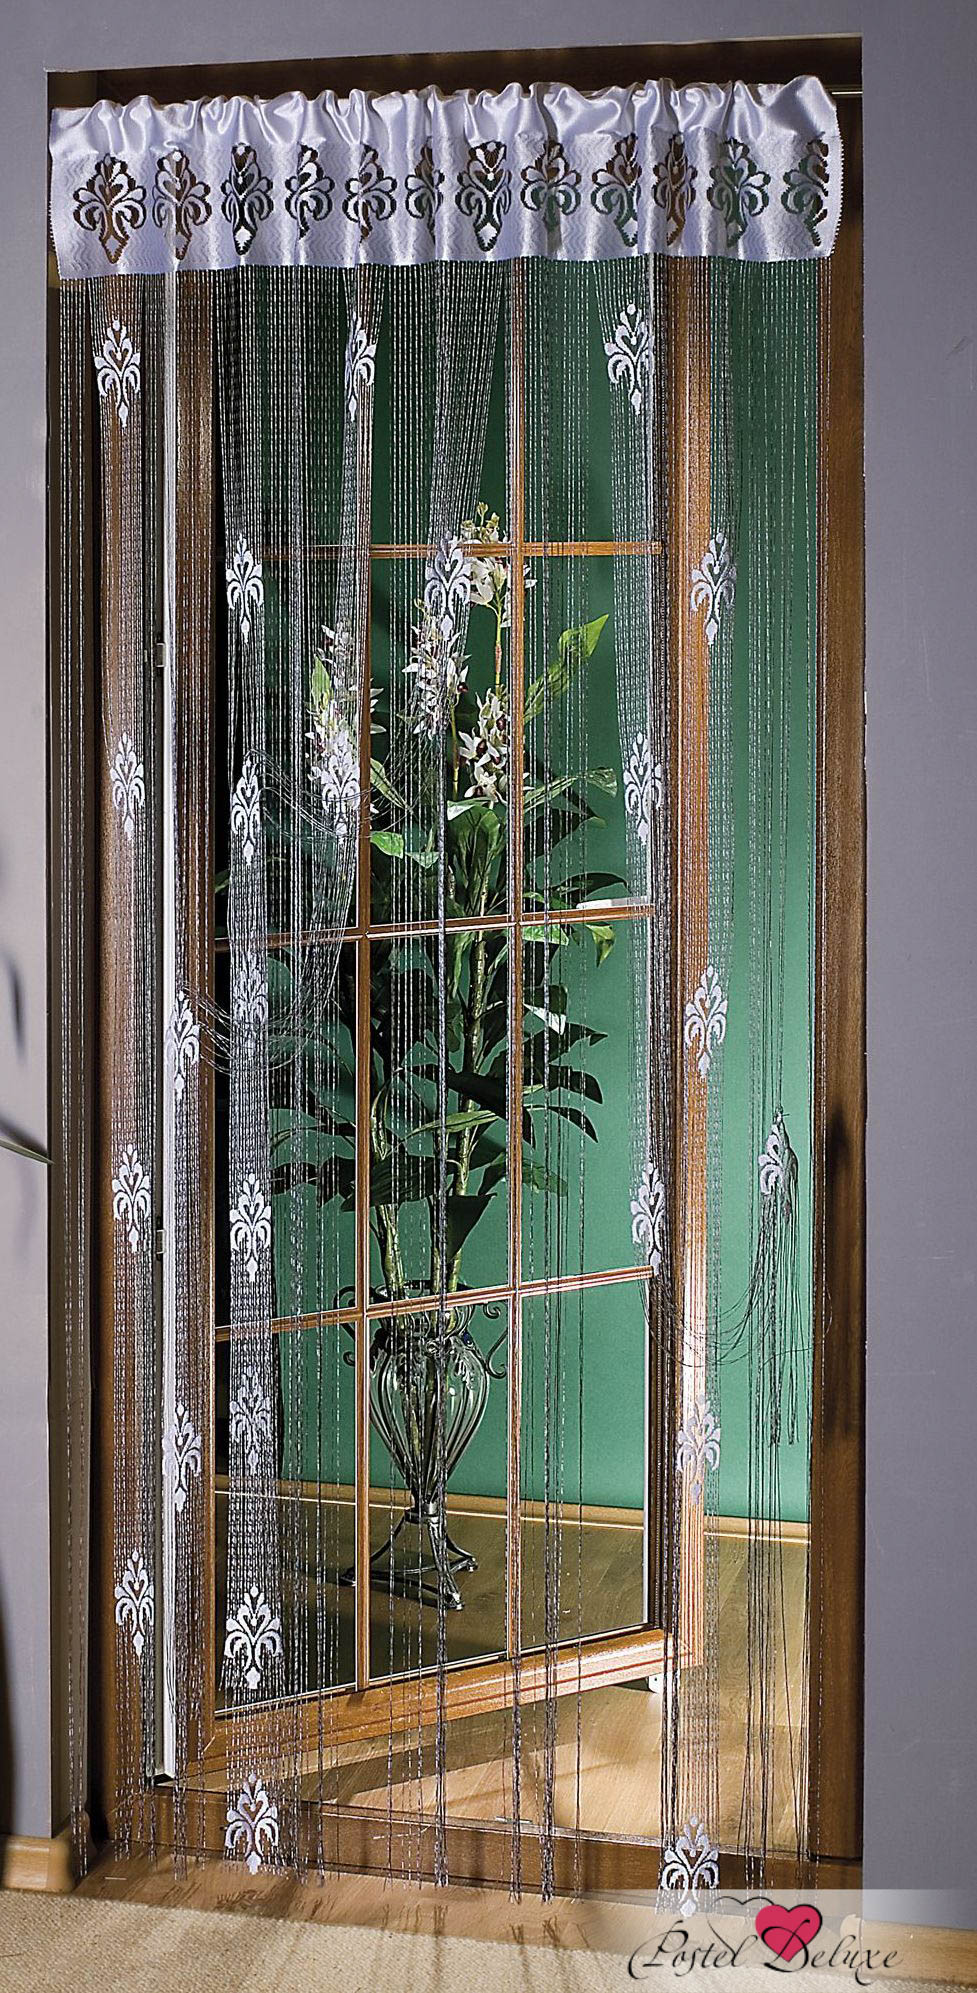 Шторы Wisan Нитяные шторы Joshua Цвет: Серебро wisan шторы бабочка